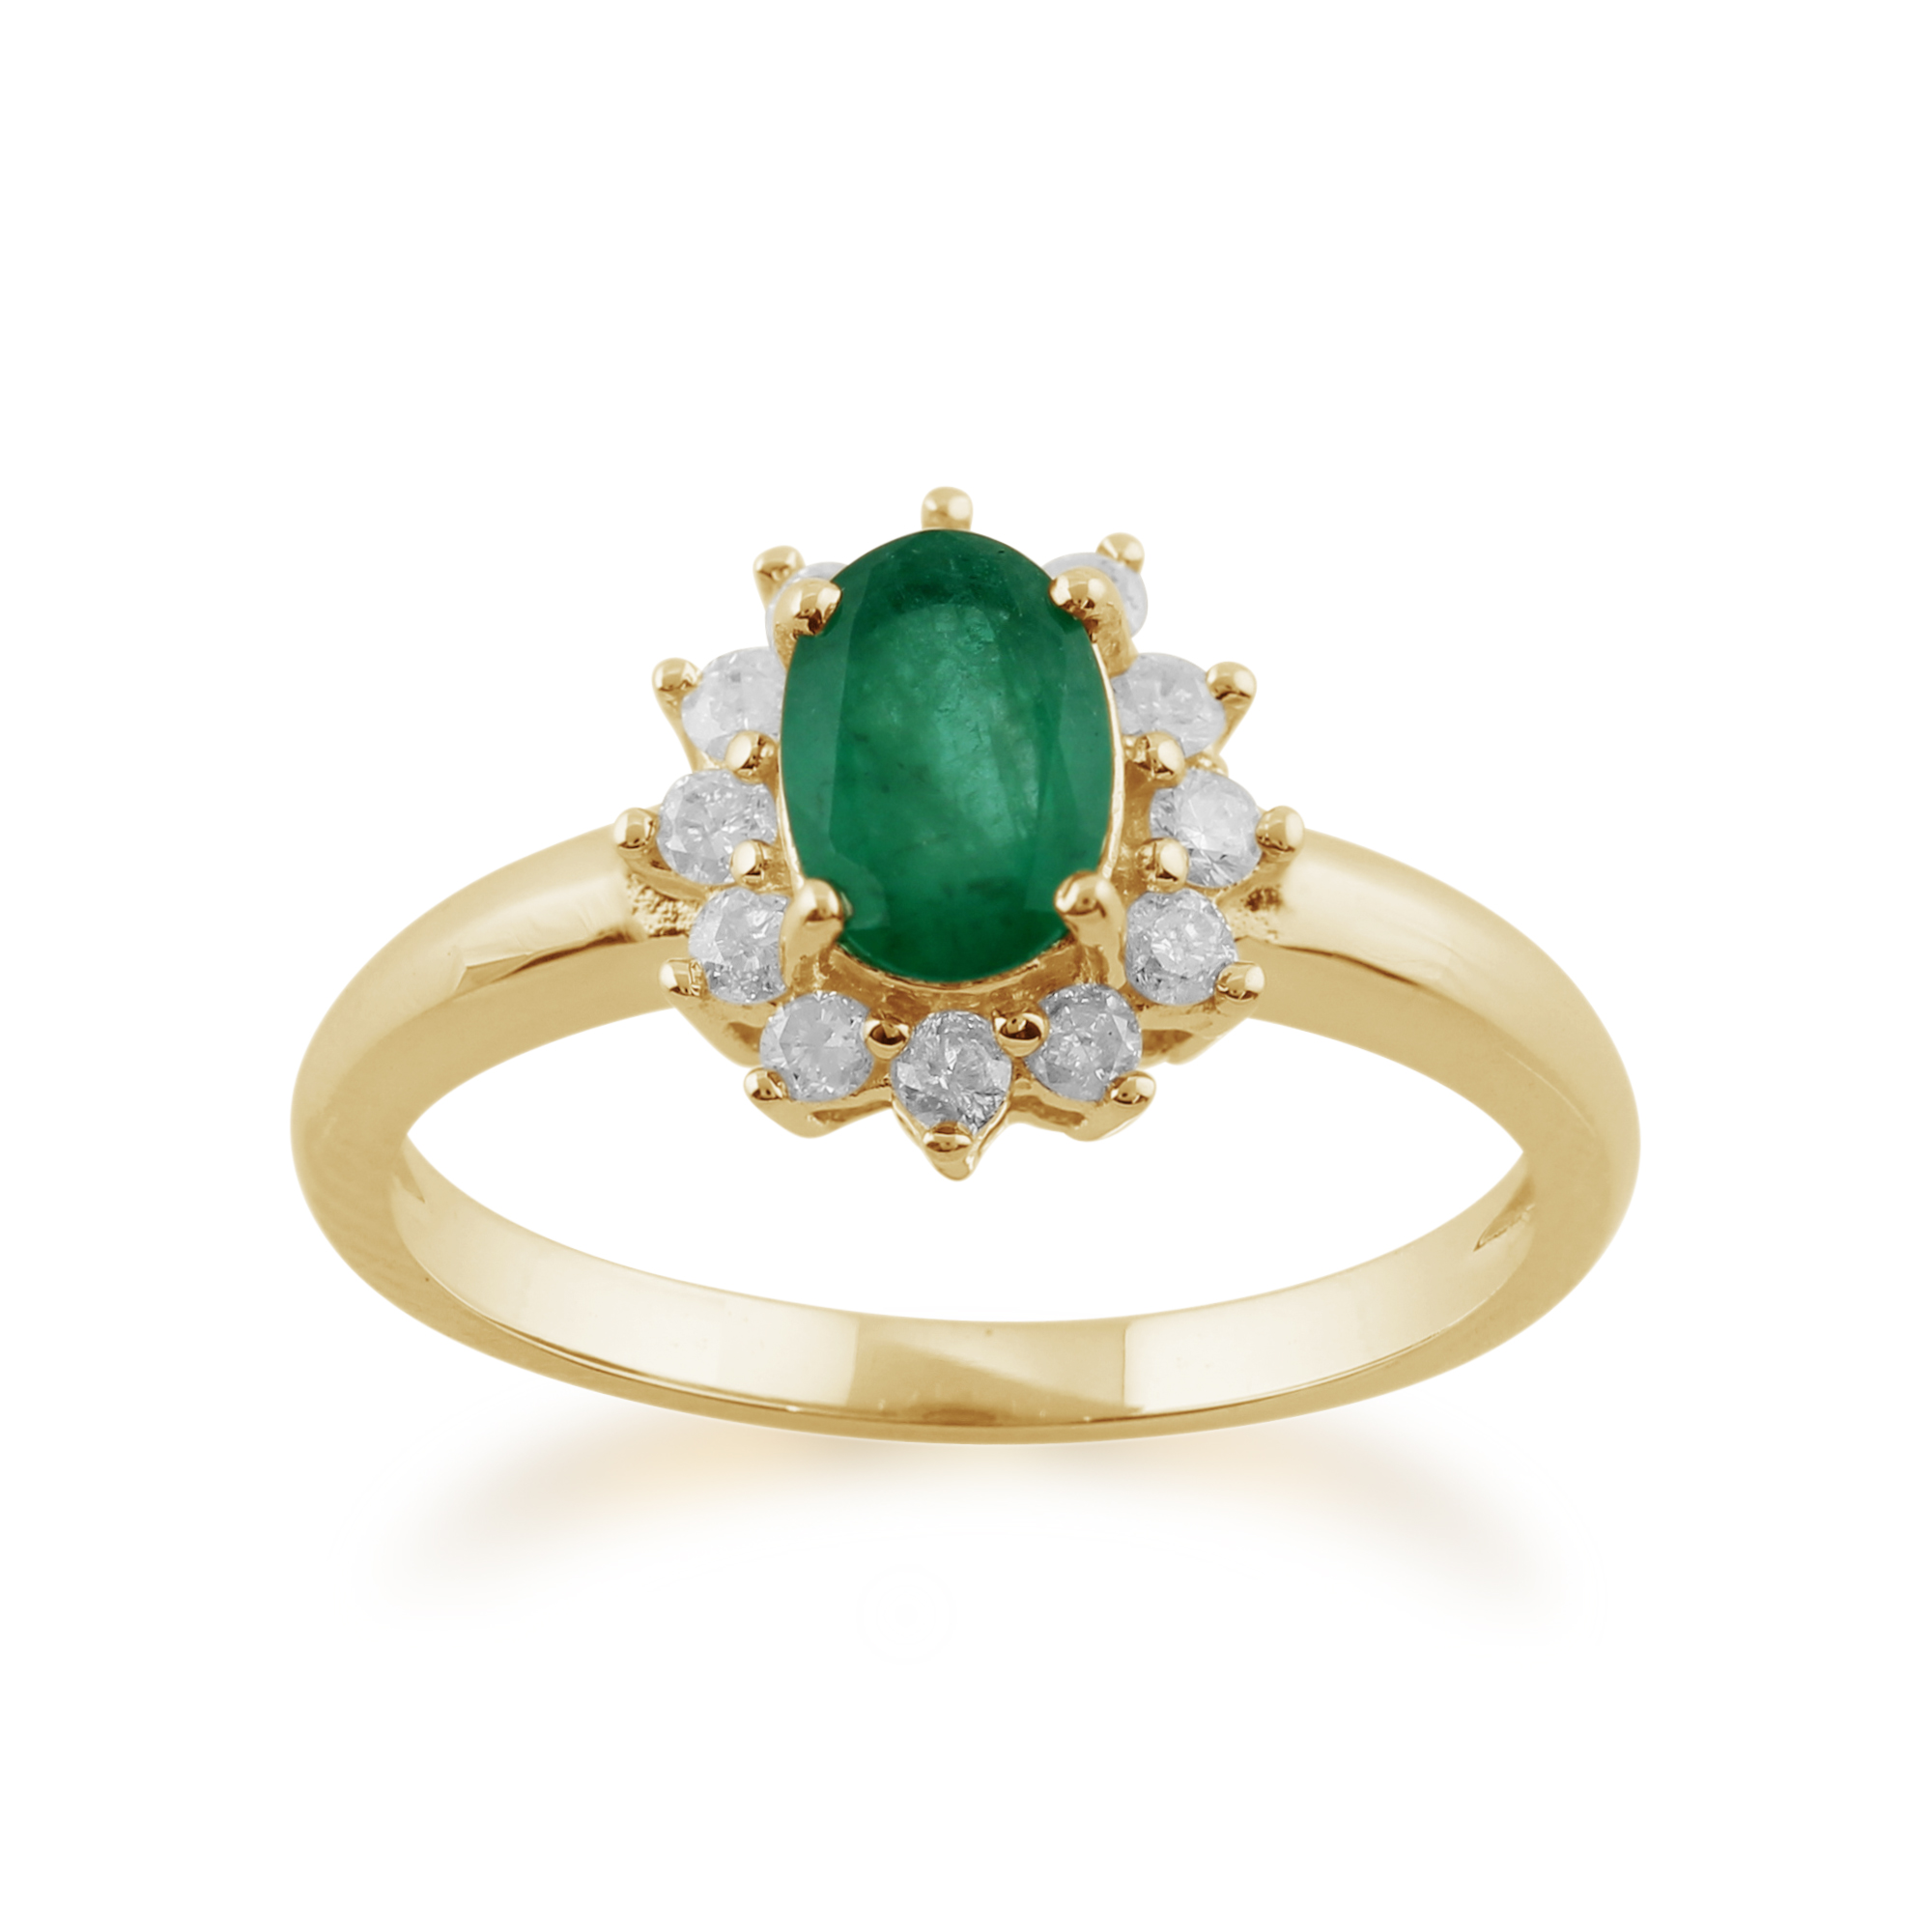 Gemondo 9ct Yellow Gold 0.83ct Emerald & Diamond Oval Cluster Ring